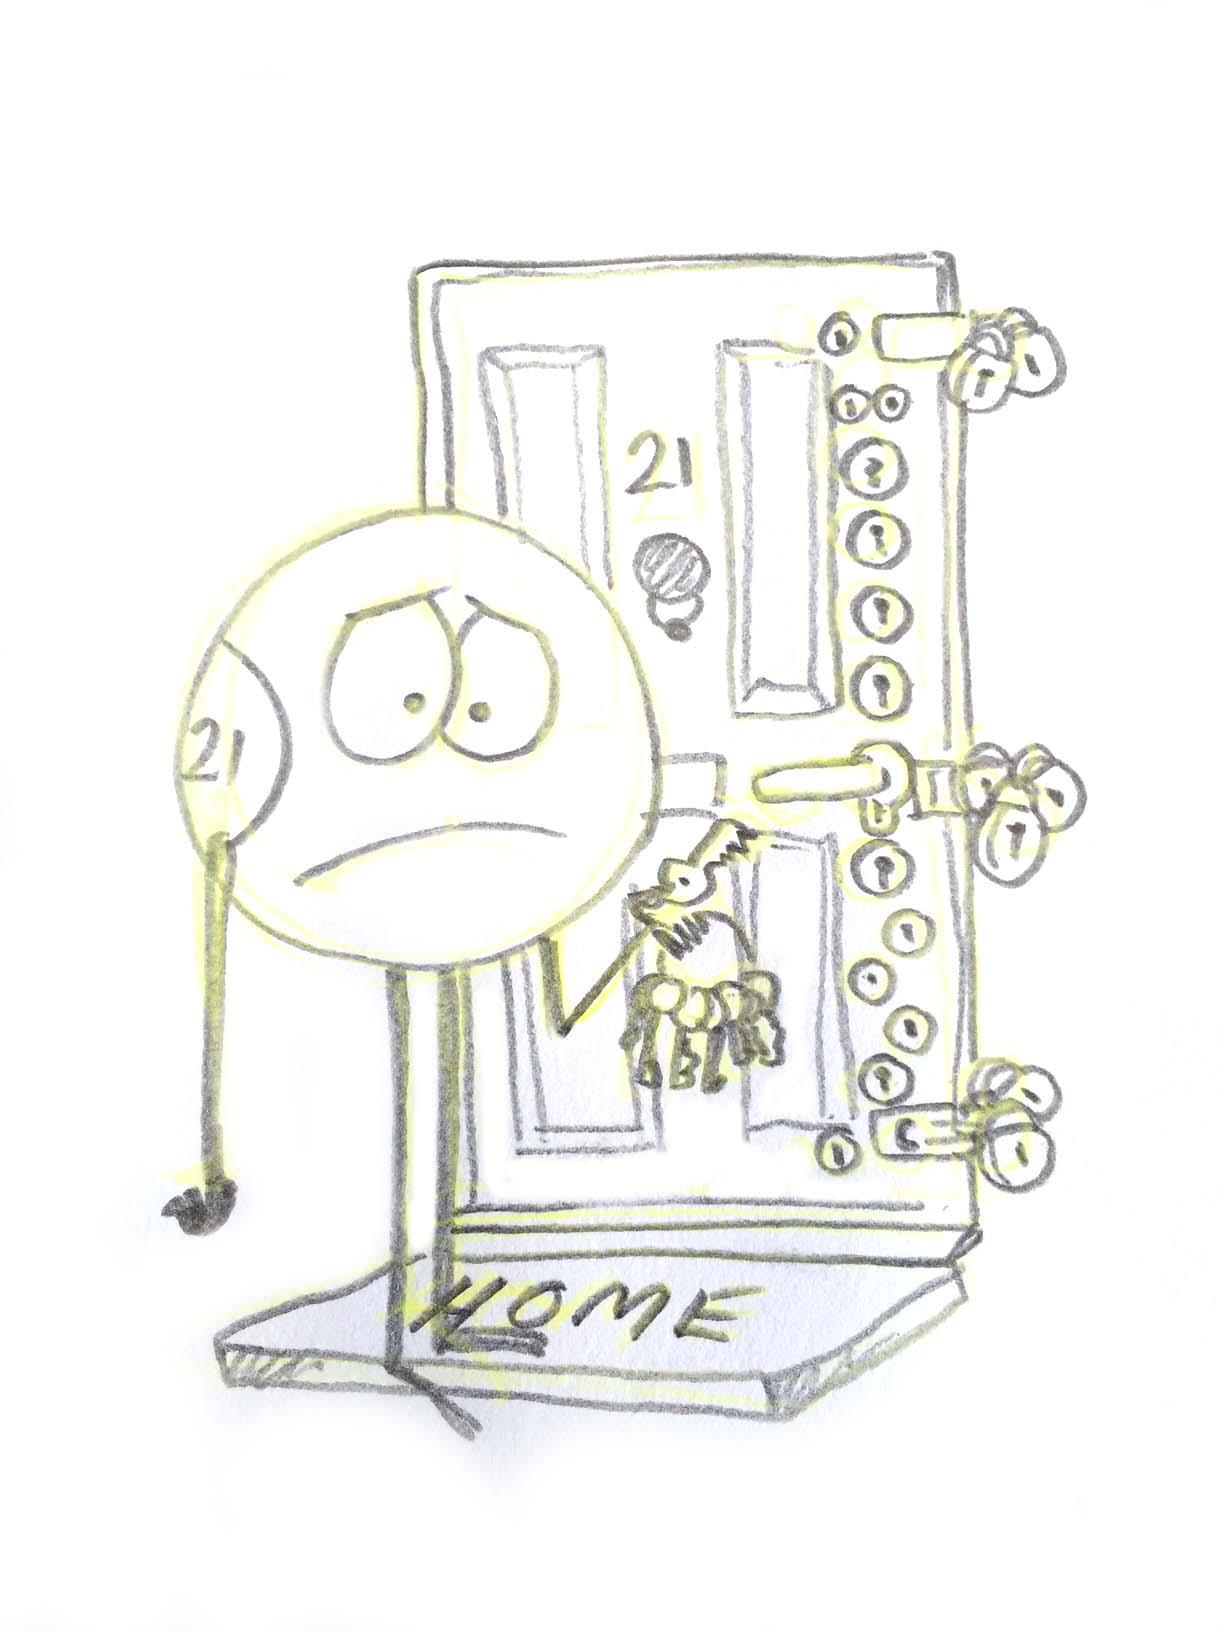 Bingo_Sketch_KeysDoor21.jpg